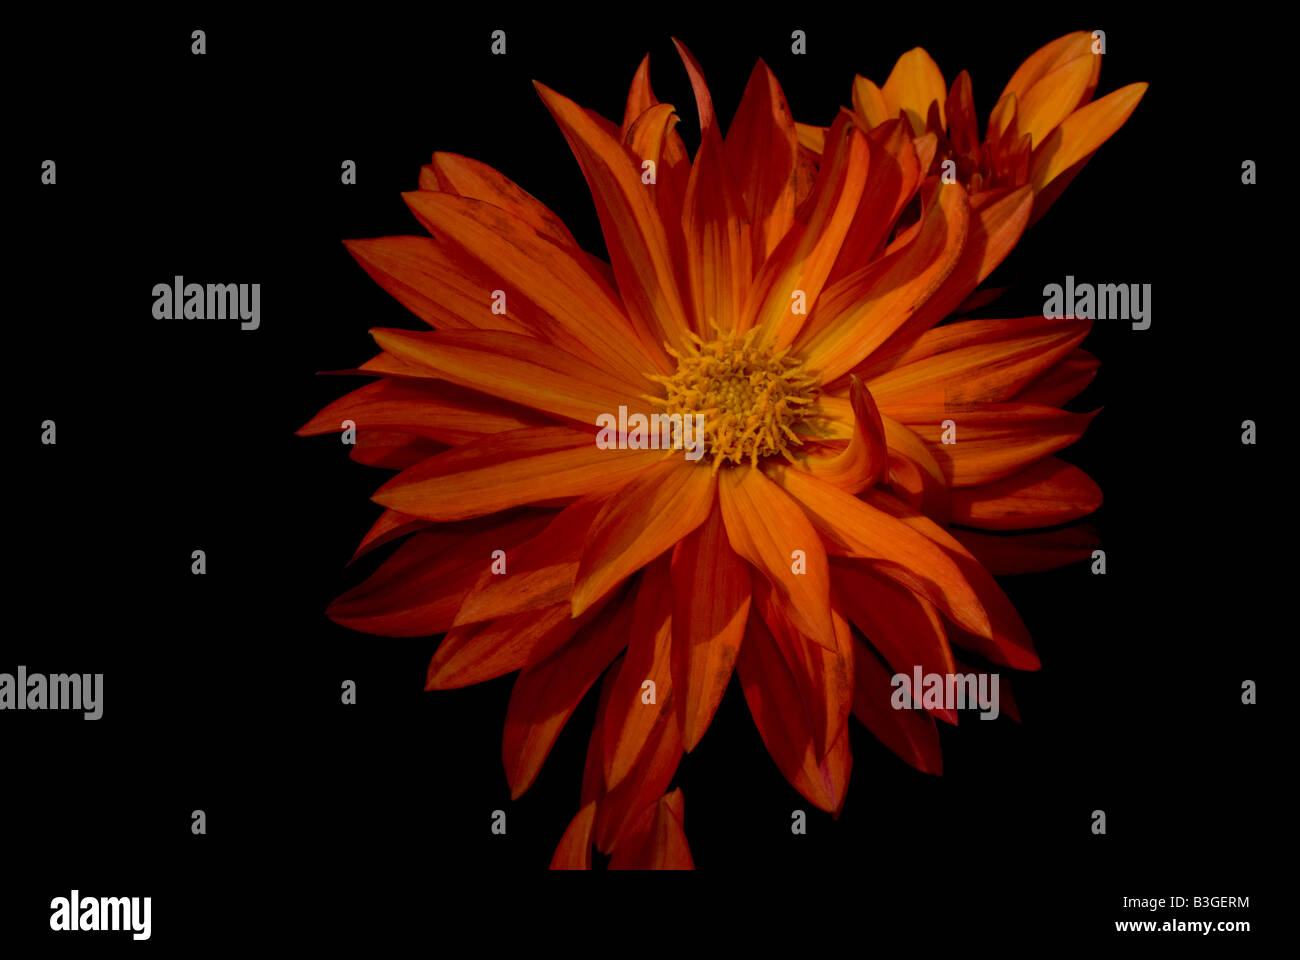 Dahlia - Stock Image